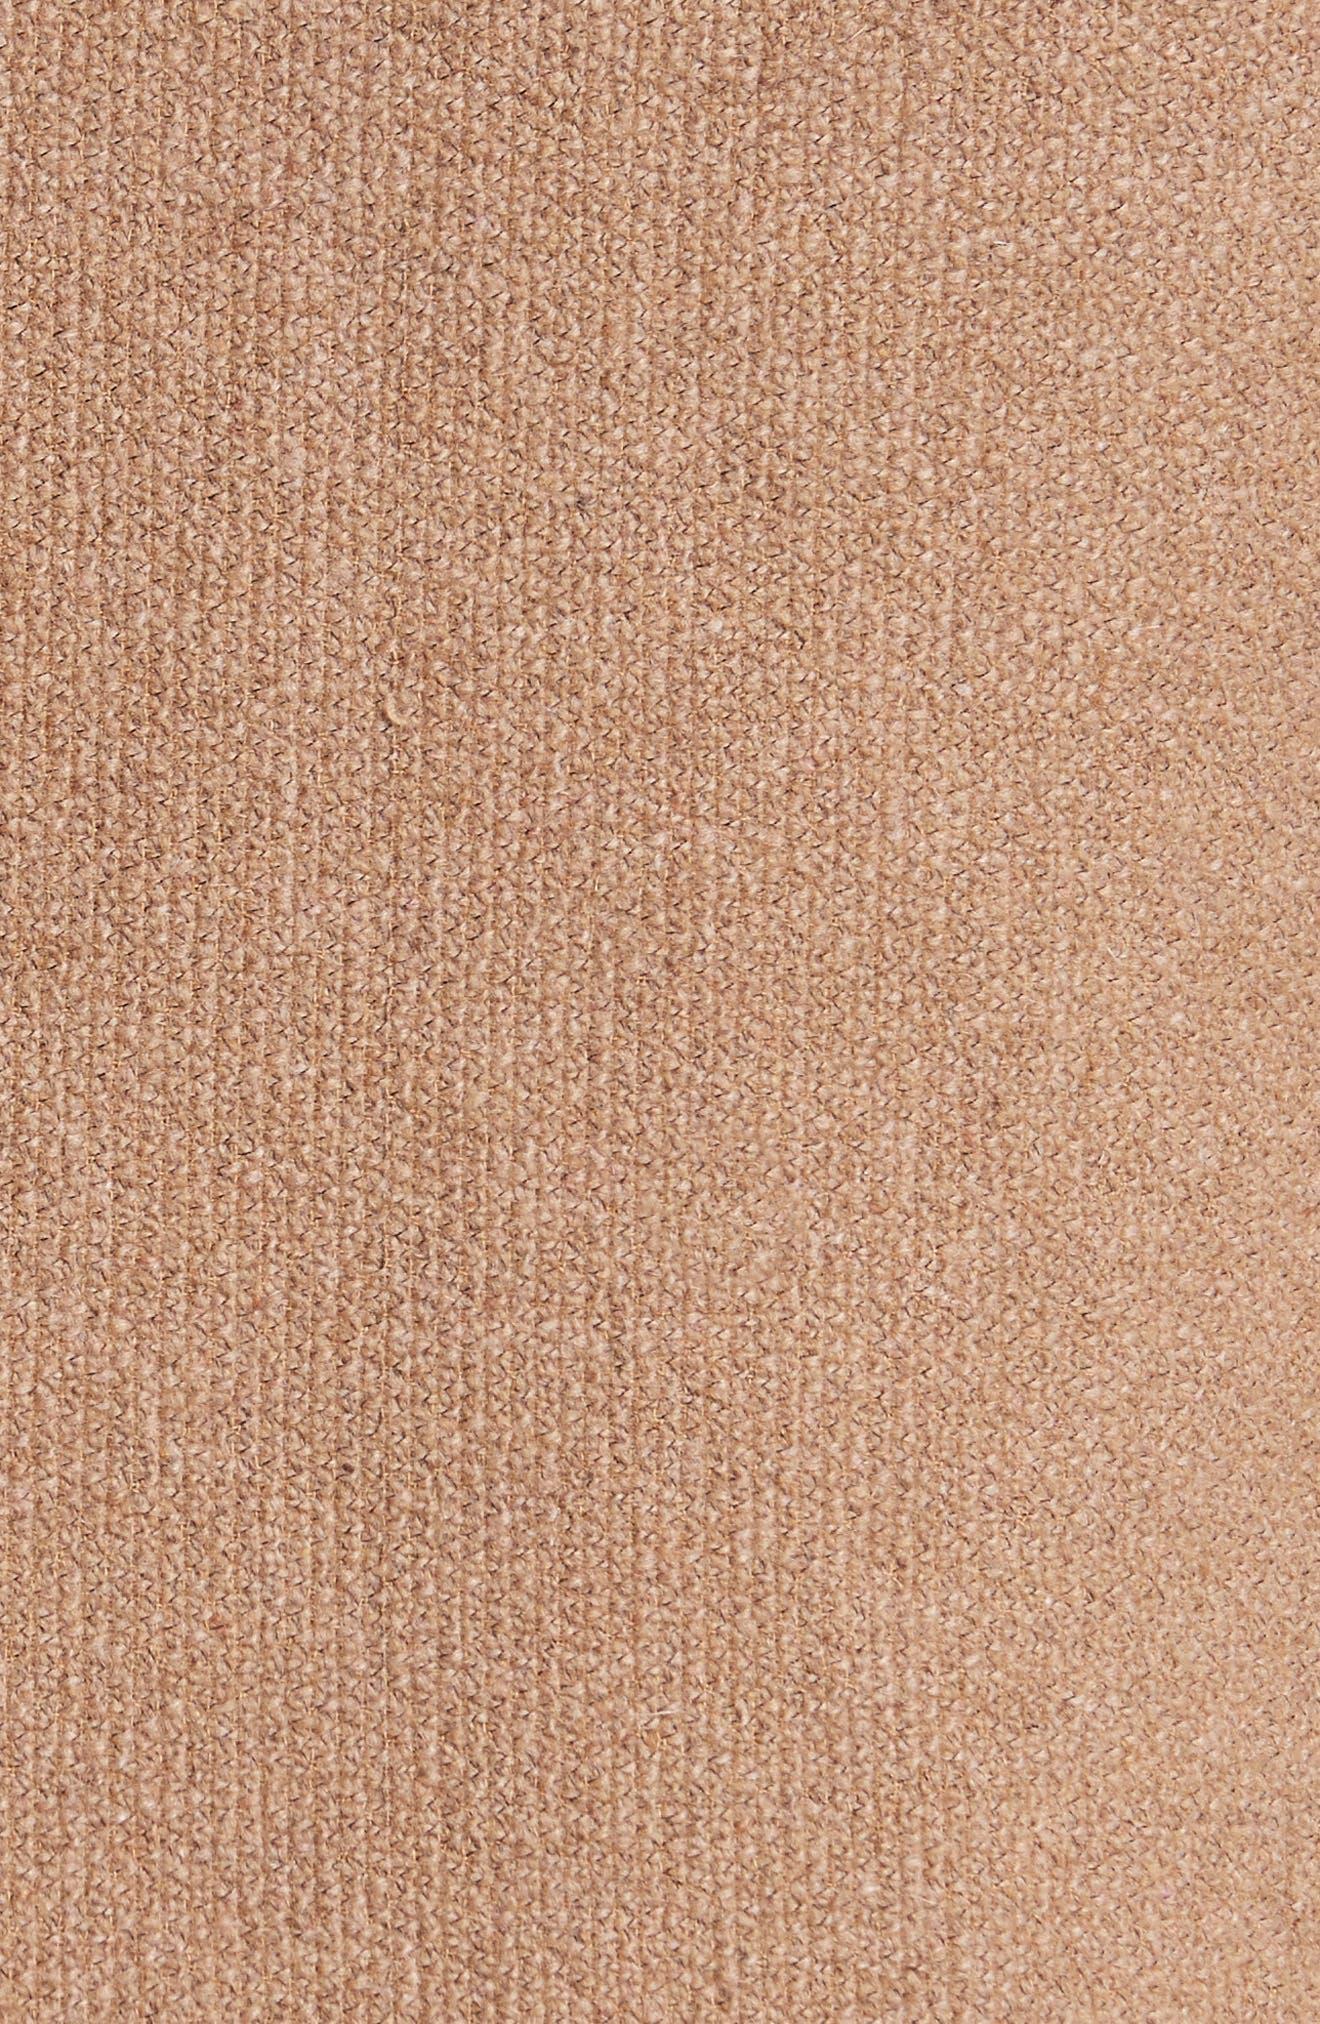 Napoli Nicola Camel Knit Wool Blazer,                             Alternate thumbnail 5, color,                             465